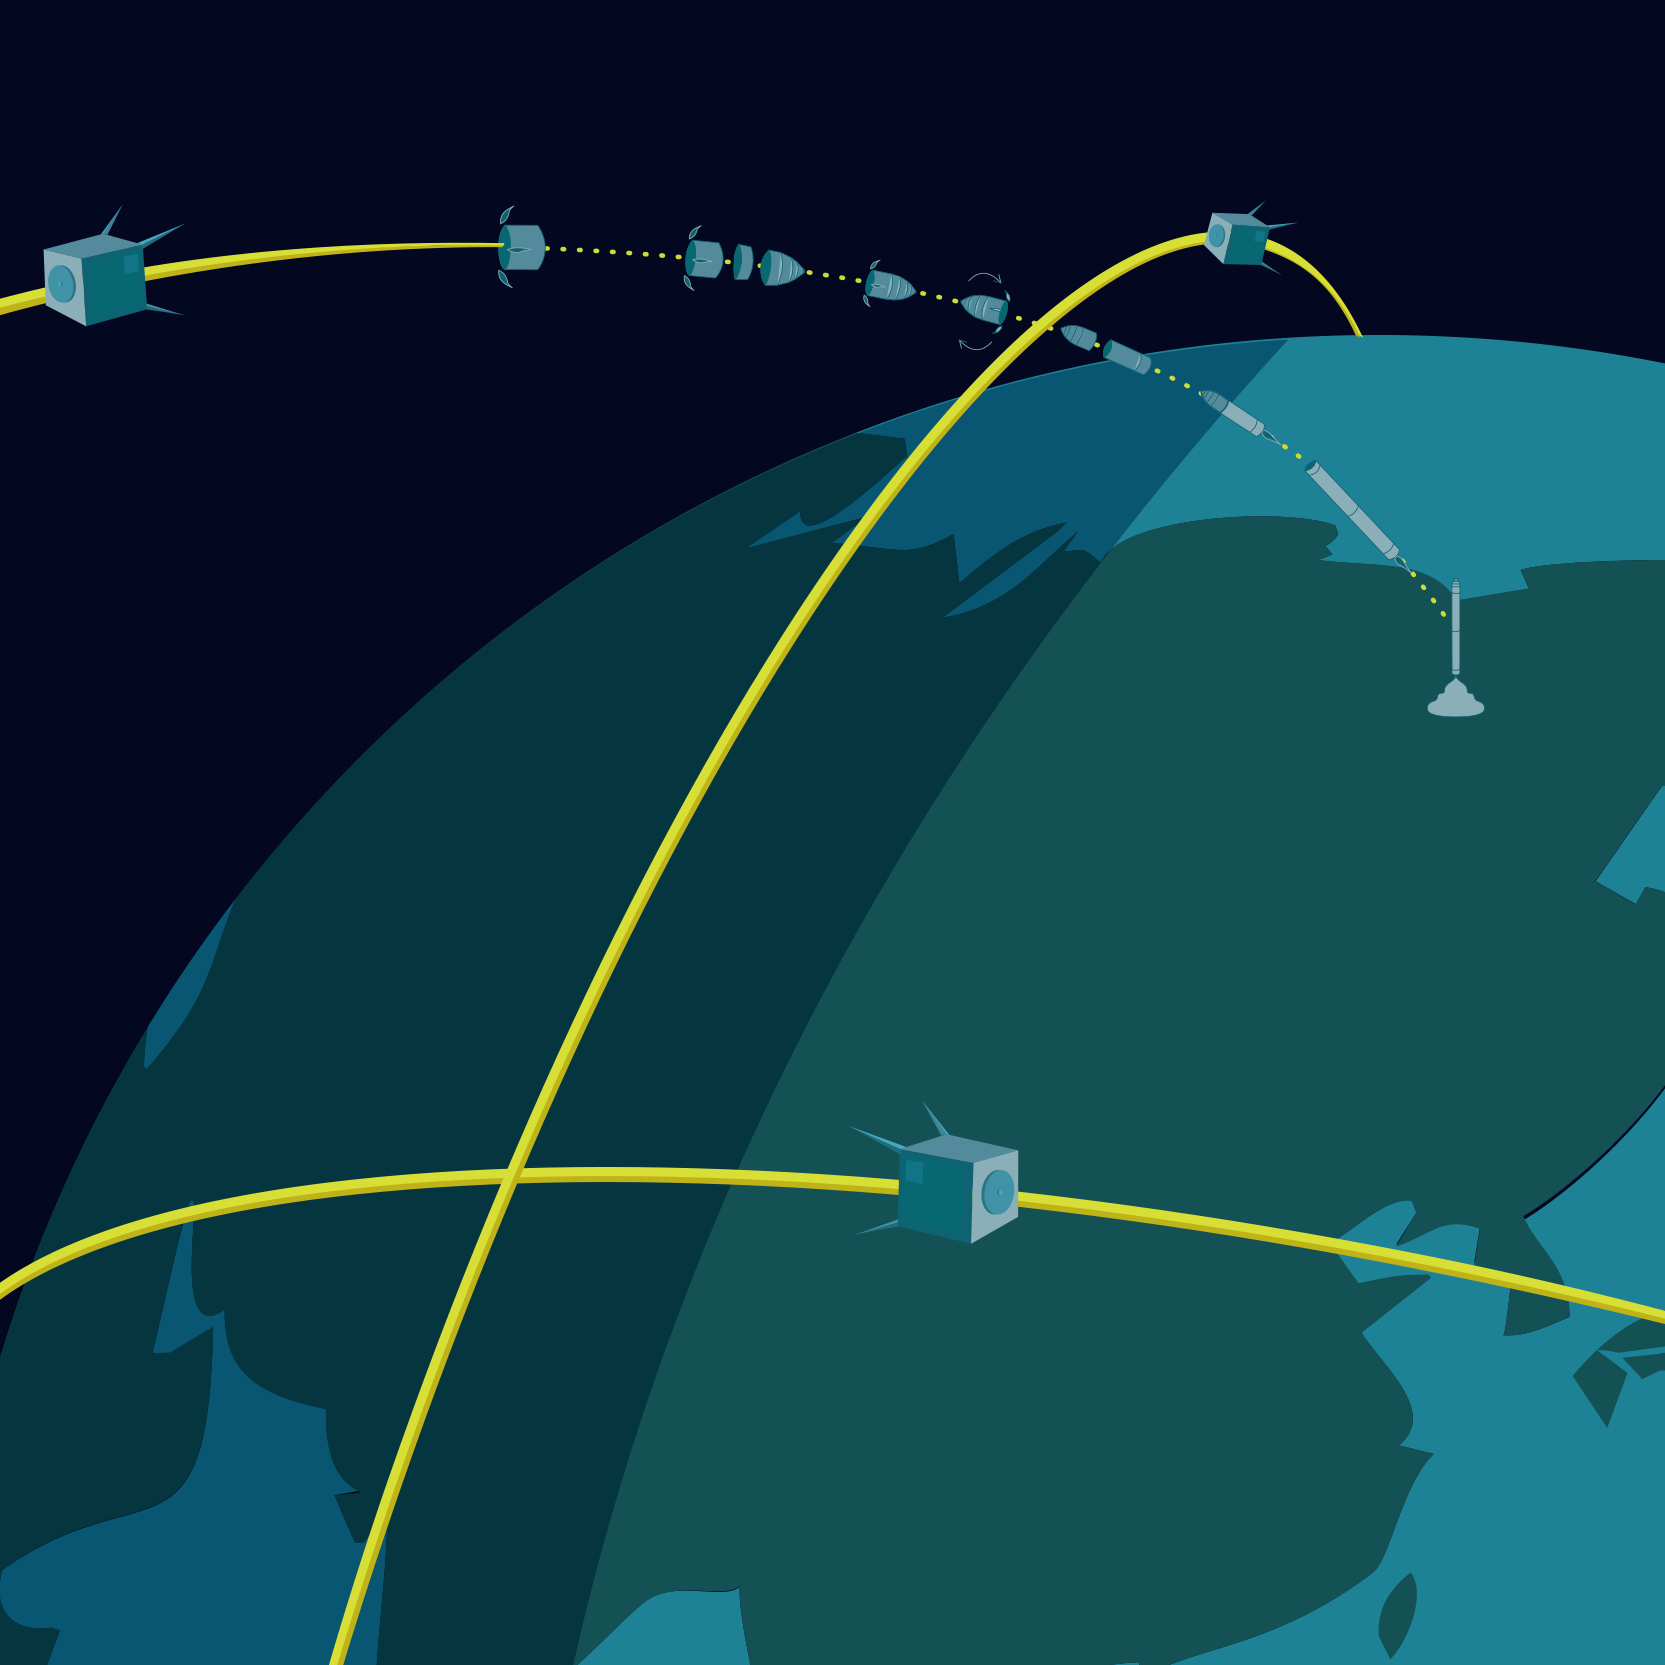 Umlaufbahn Satelliten (Image by Global Star ALE)